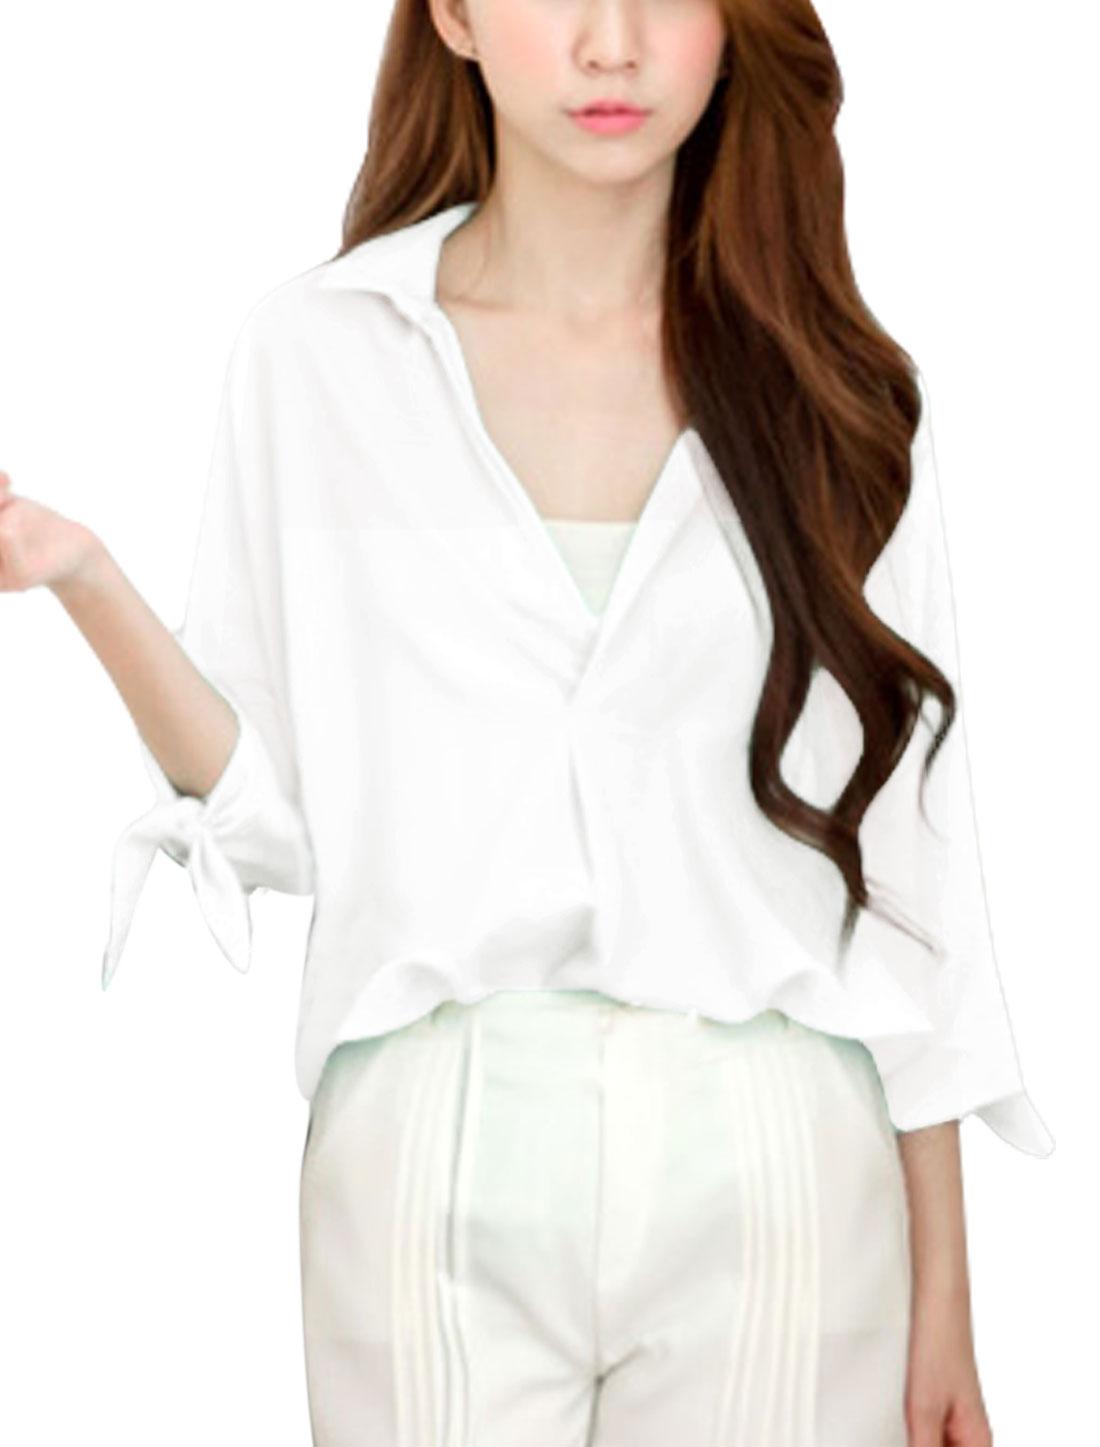 Women 3/4 Batwing Sleeves Self Bowtie Cuffs Leisure Shirt White S